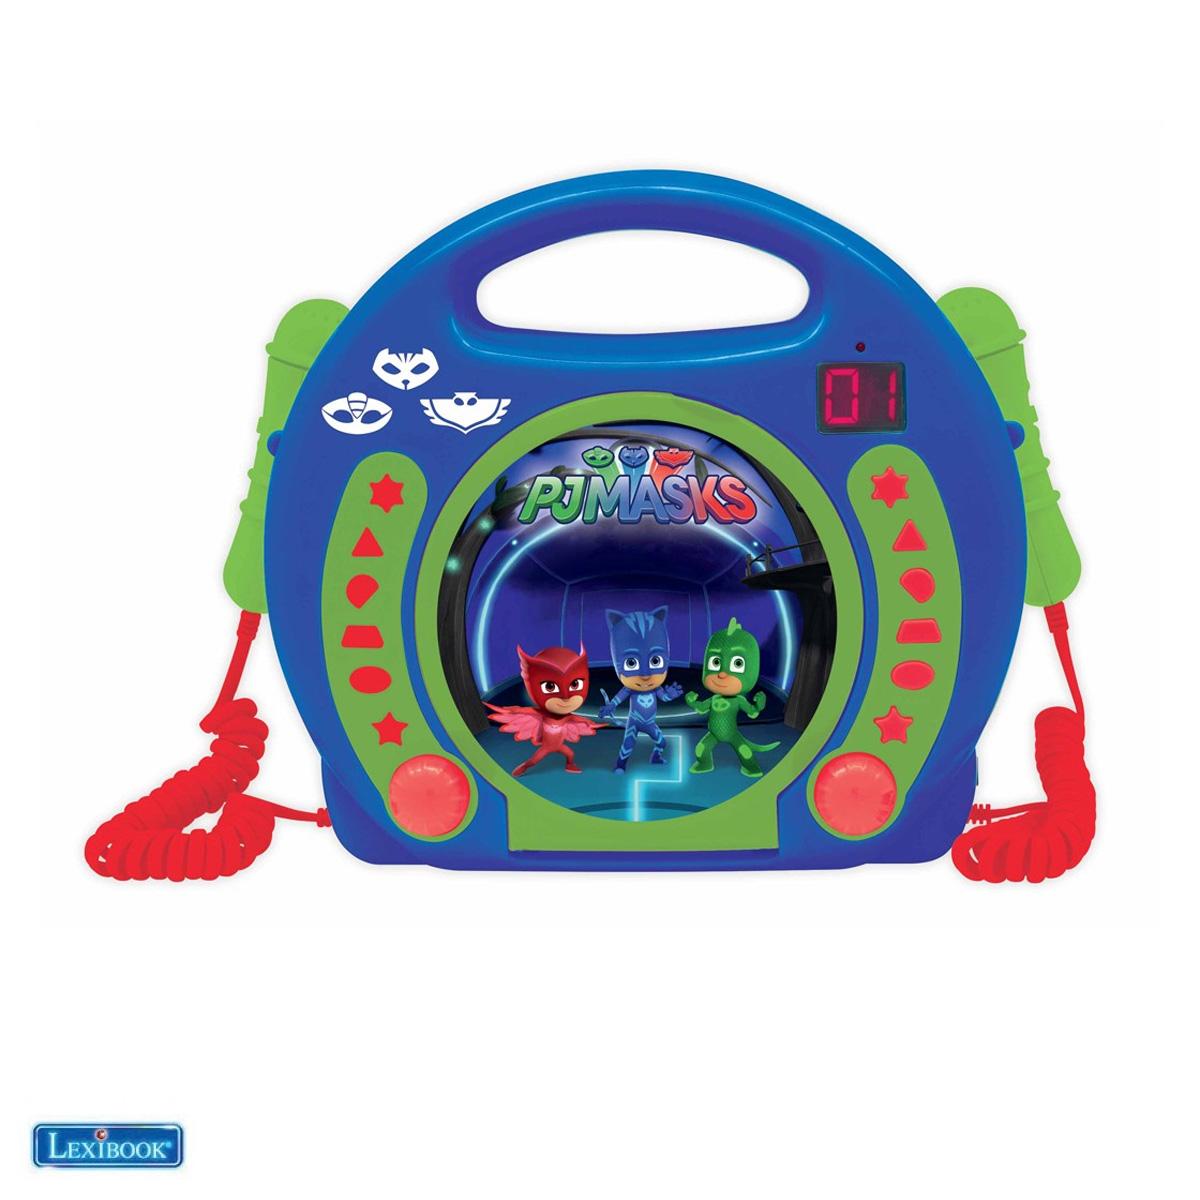 Lexibook - PJ Masks Portable CD player with 2 Sing Along microphones (RCDK100PJM)